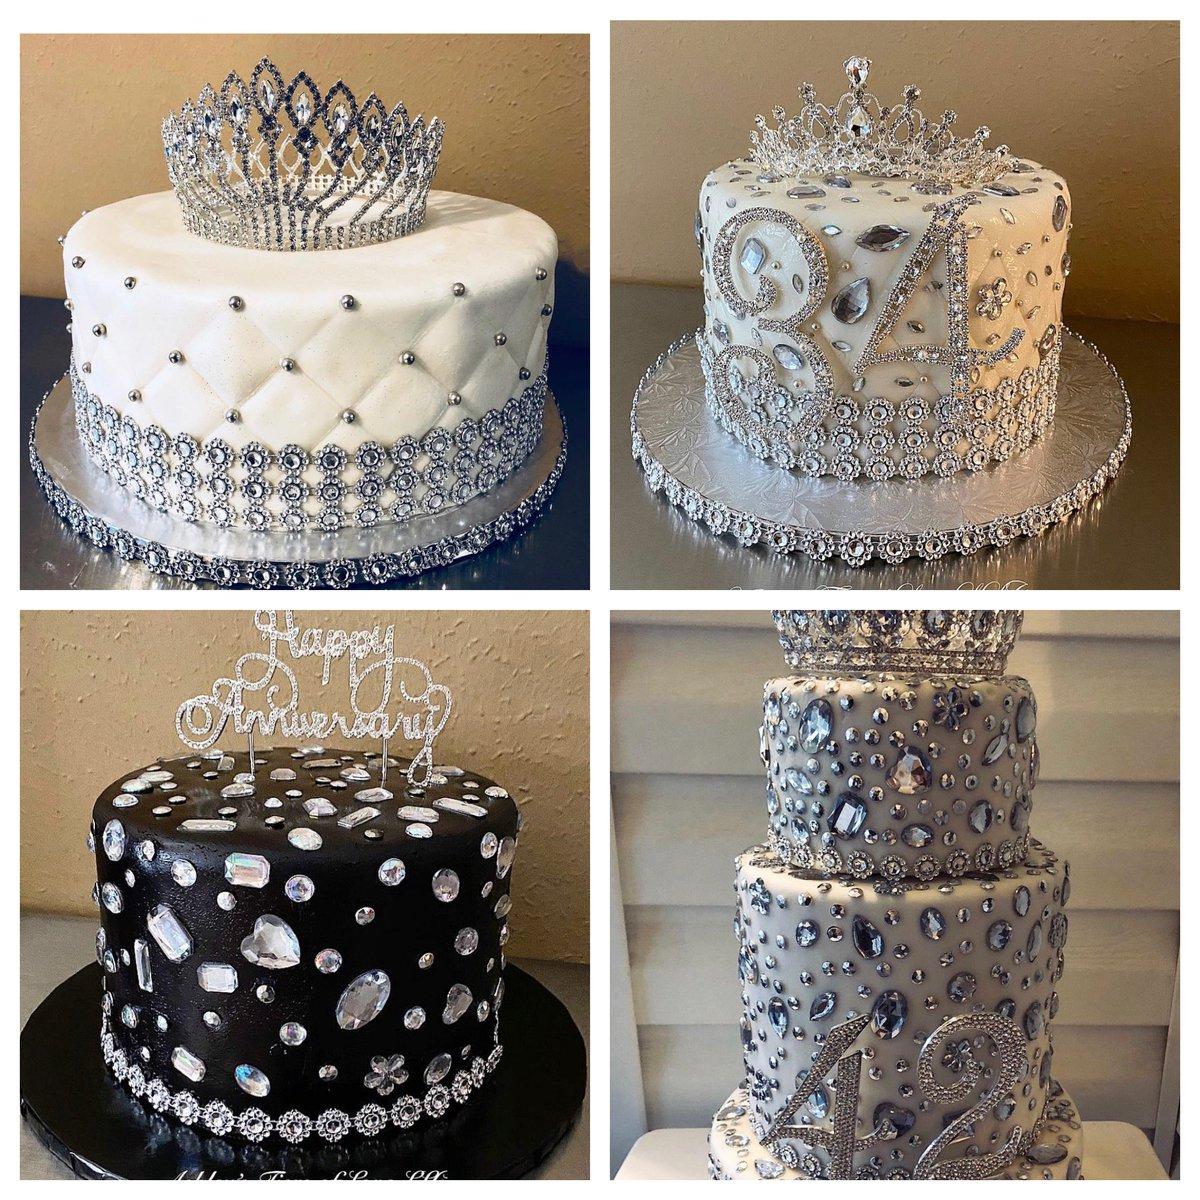 Many people have, like uncut diamonds, shining qualities beneath a rough exterior #shine #begreat #greatness #cake #cakedecorating #SuccessMindset #Entrepreneur